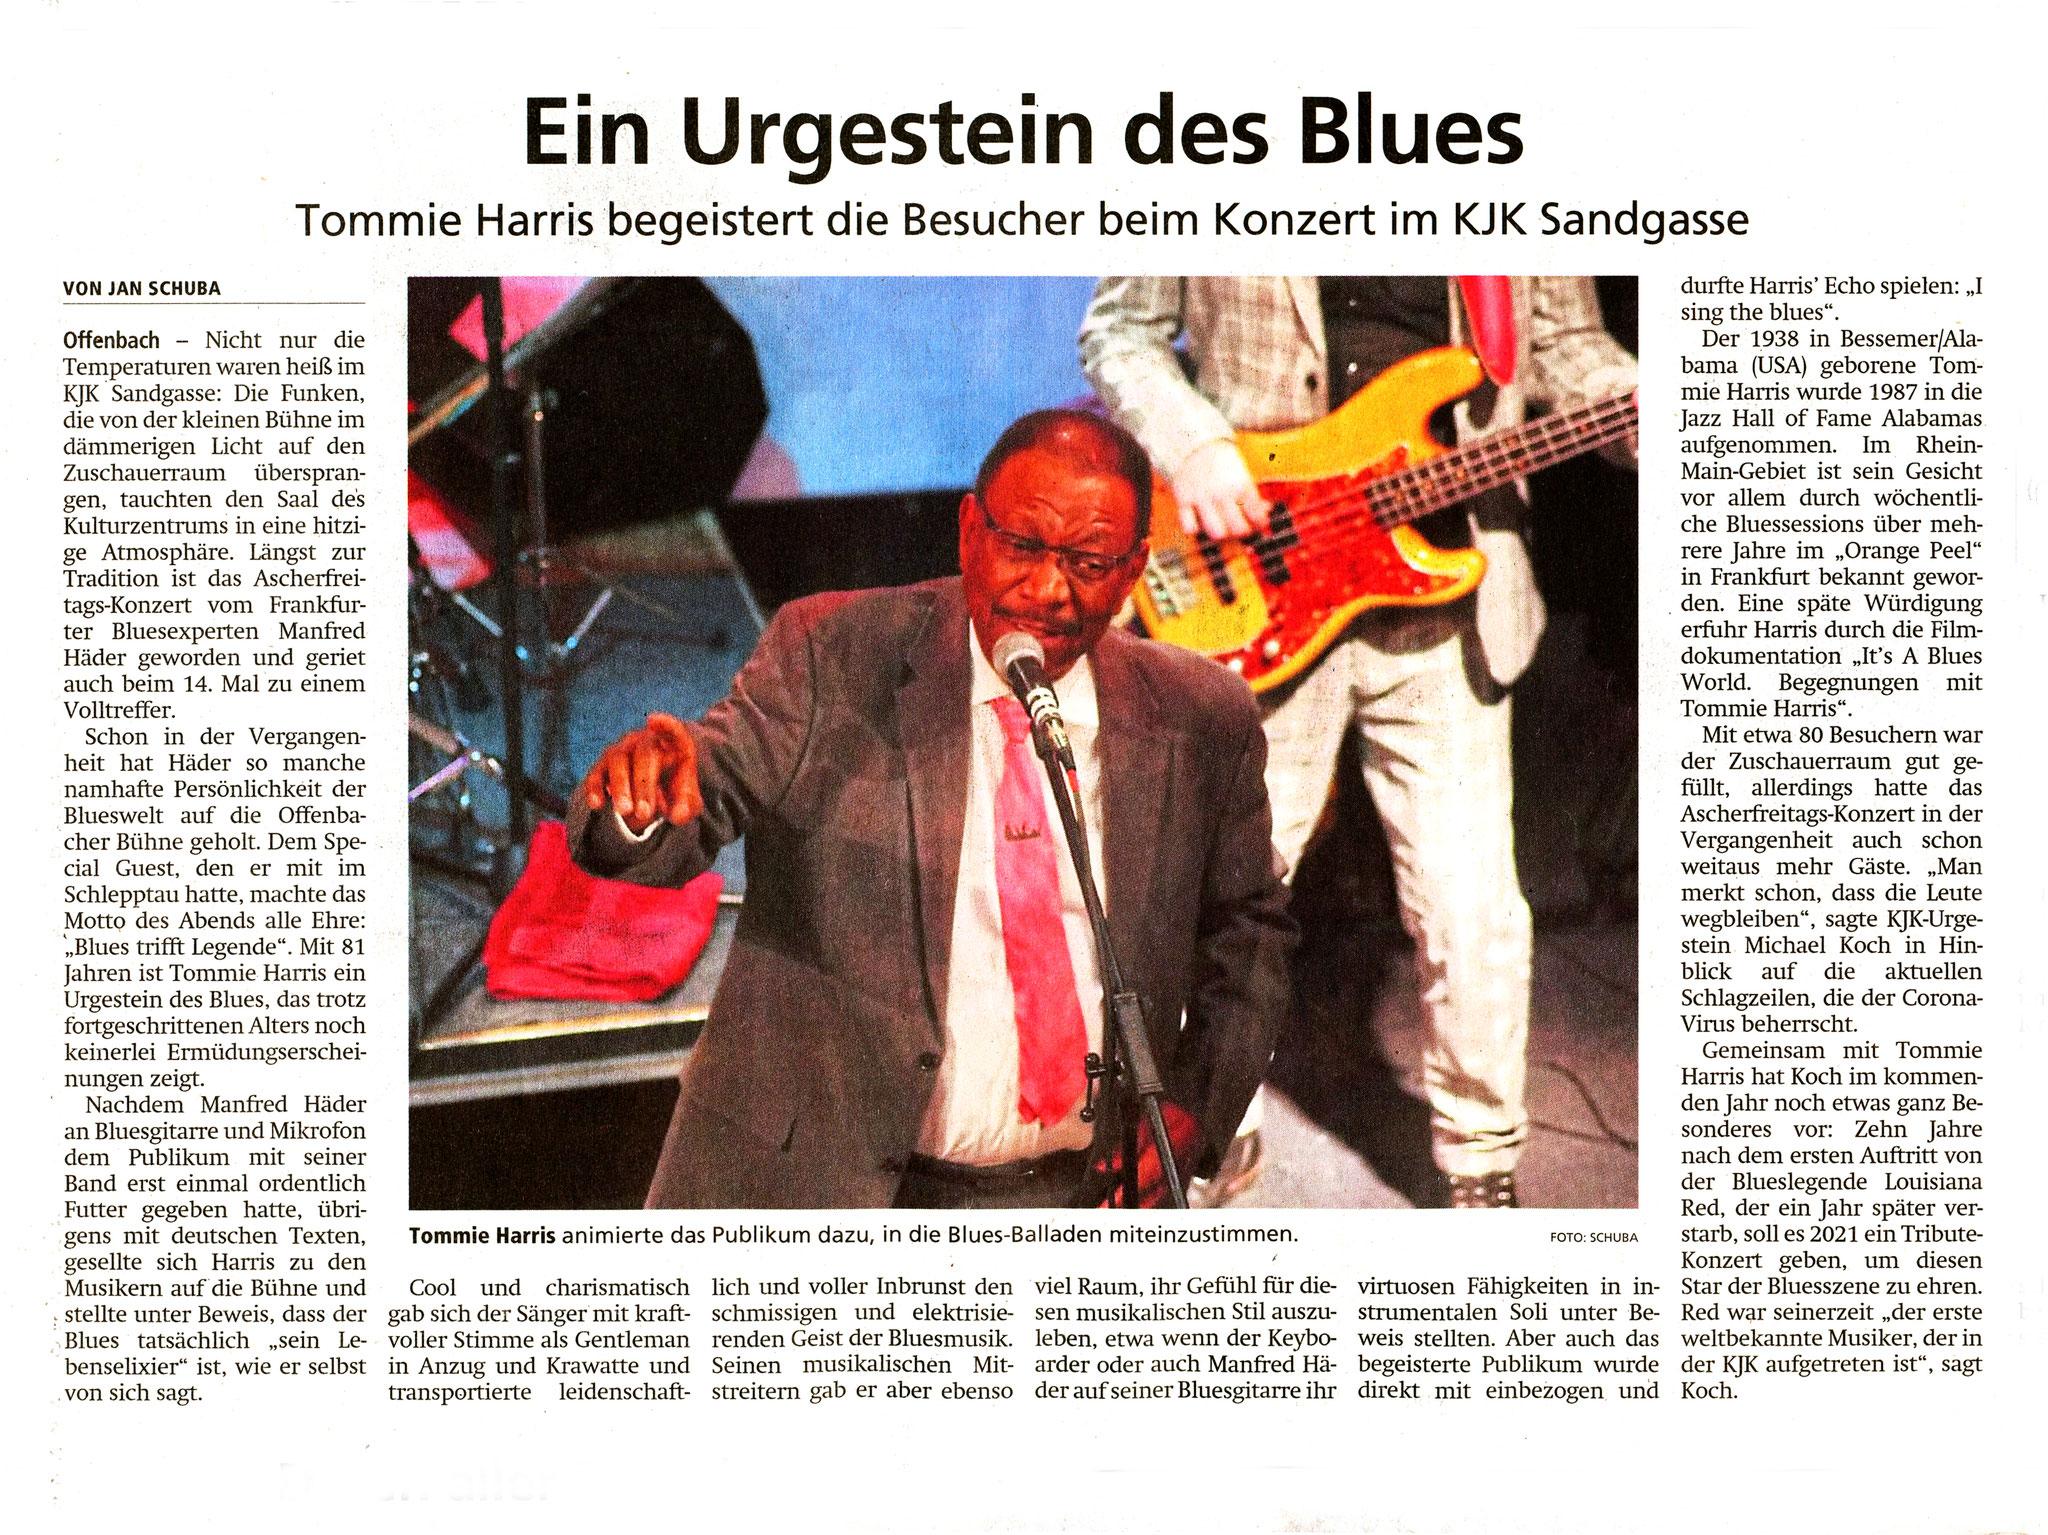 Offenbach Post, 2. März 2020